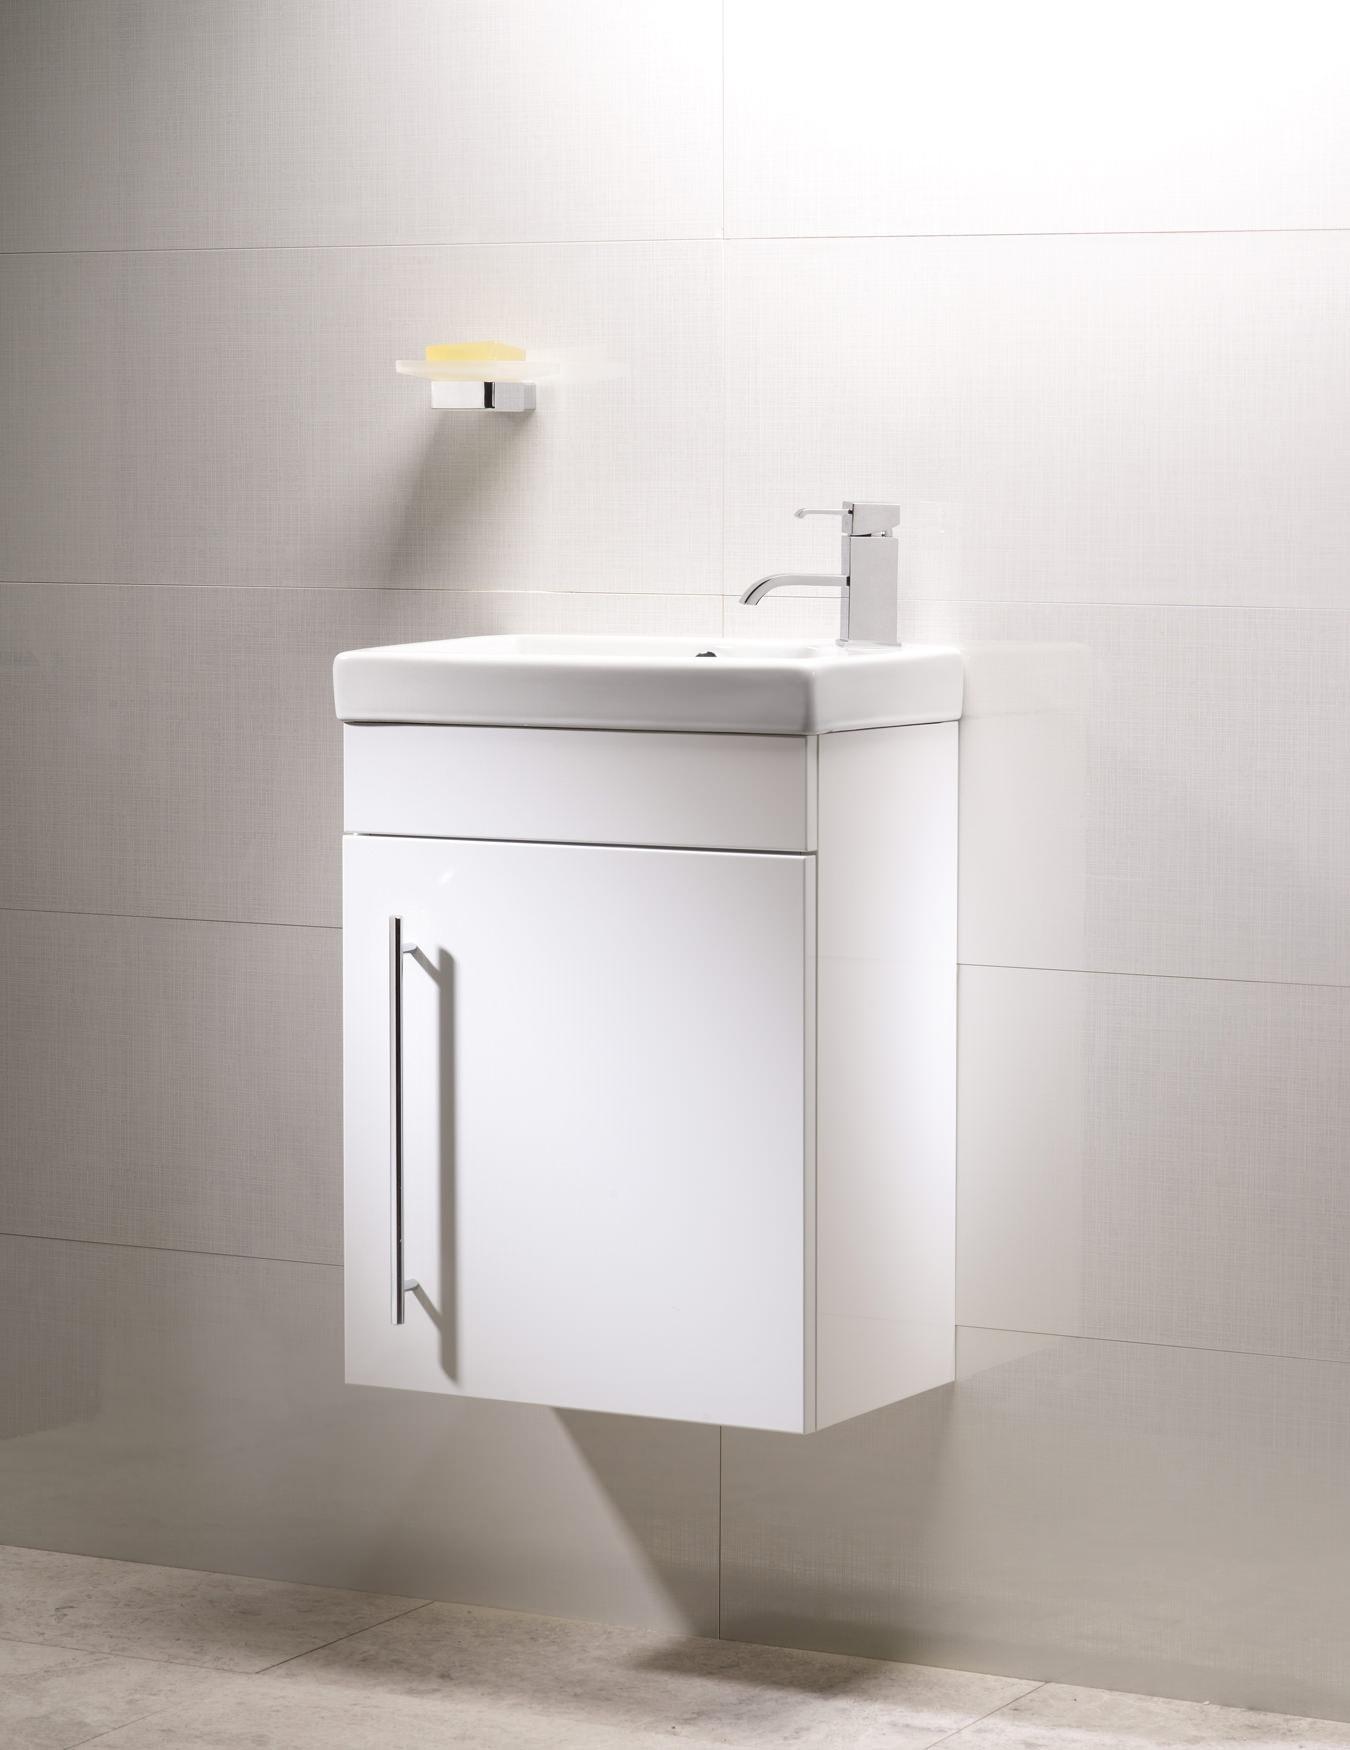 roper rhodes esta mm white wall mounted vanity unit and basin  - roper rhodes esta mm white wall mounted vanity unit and basin